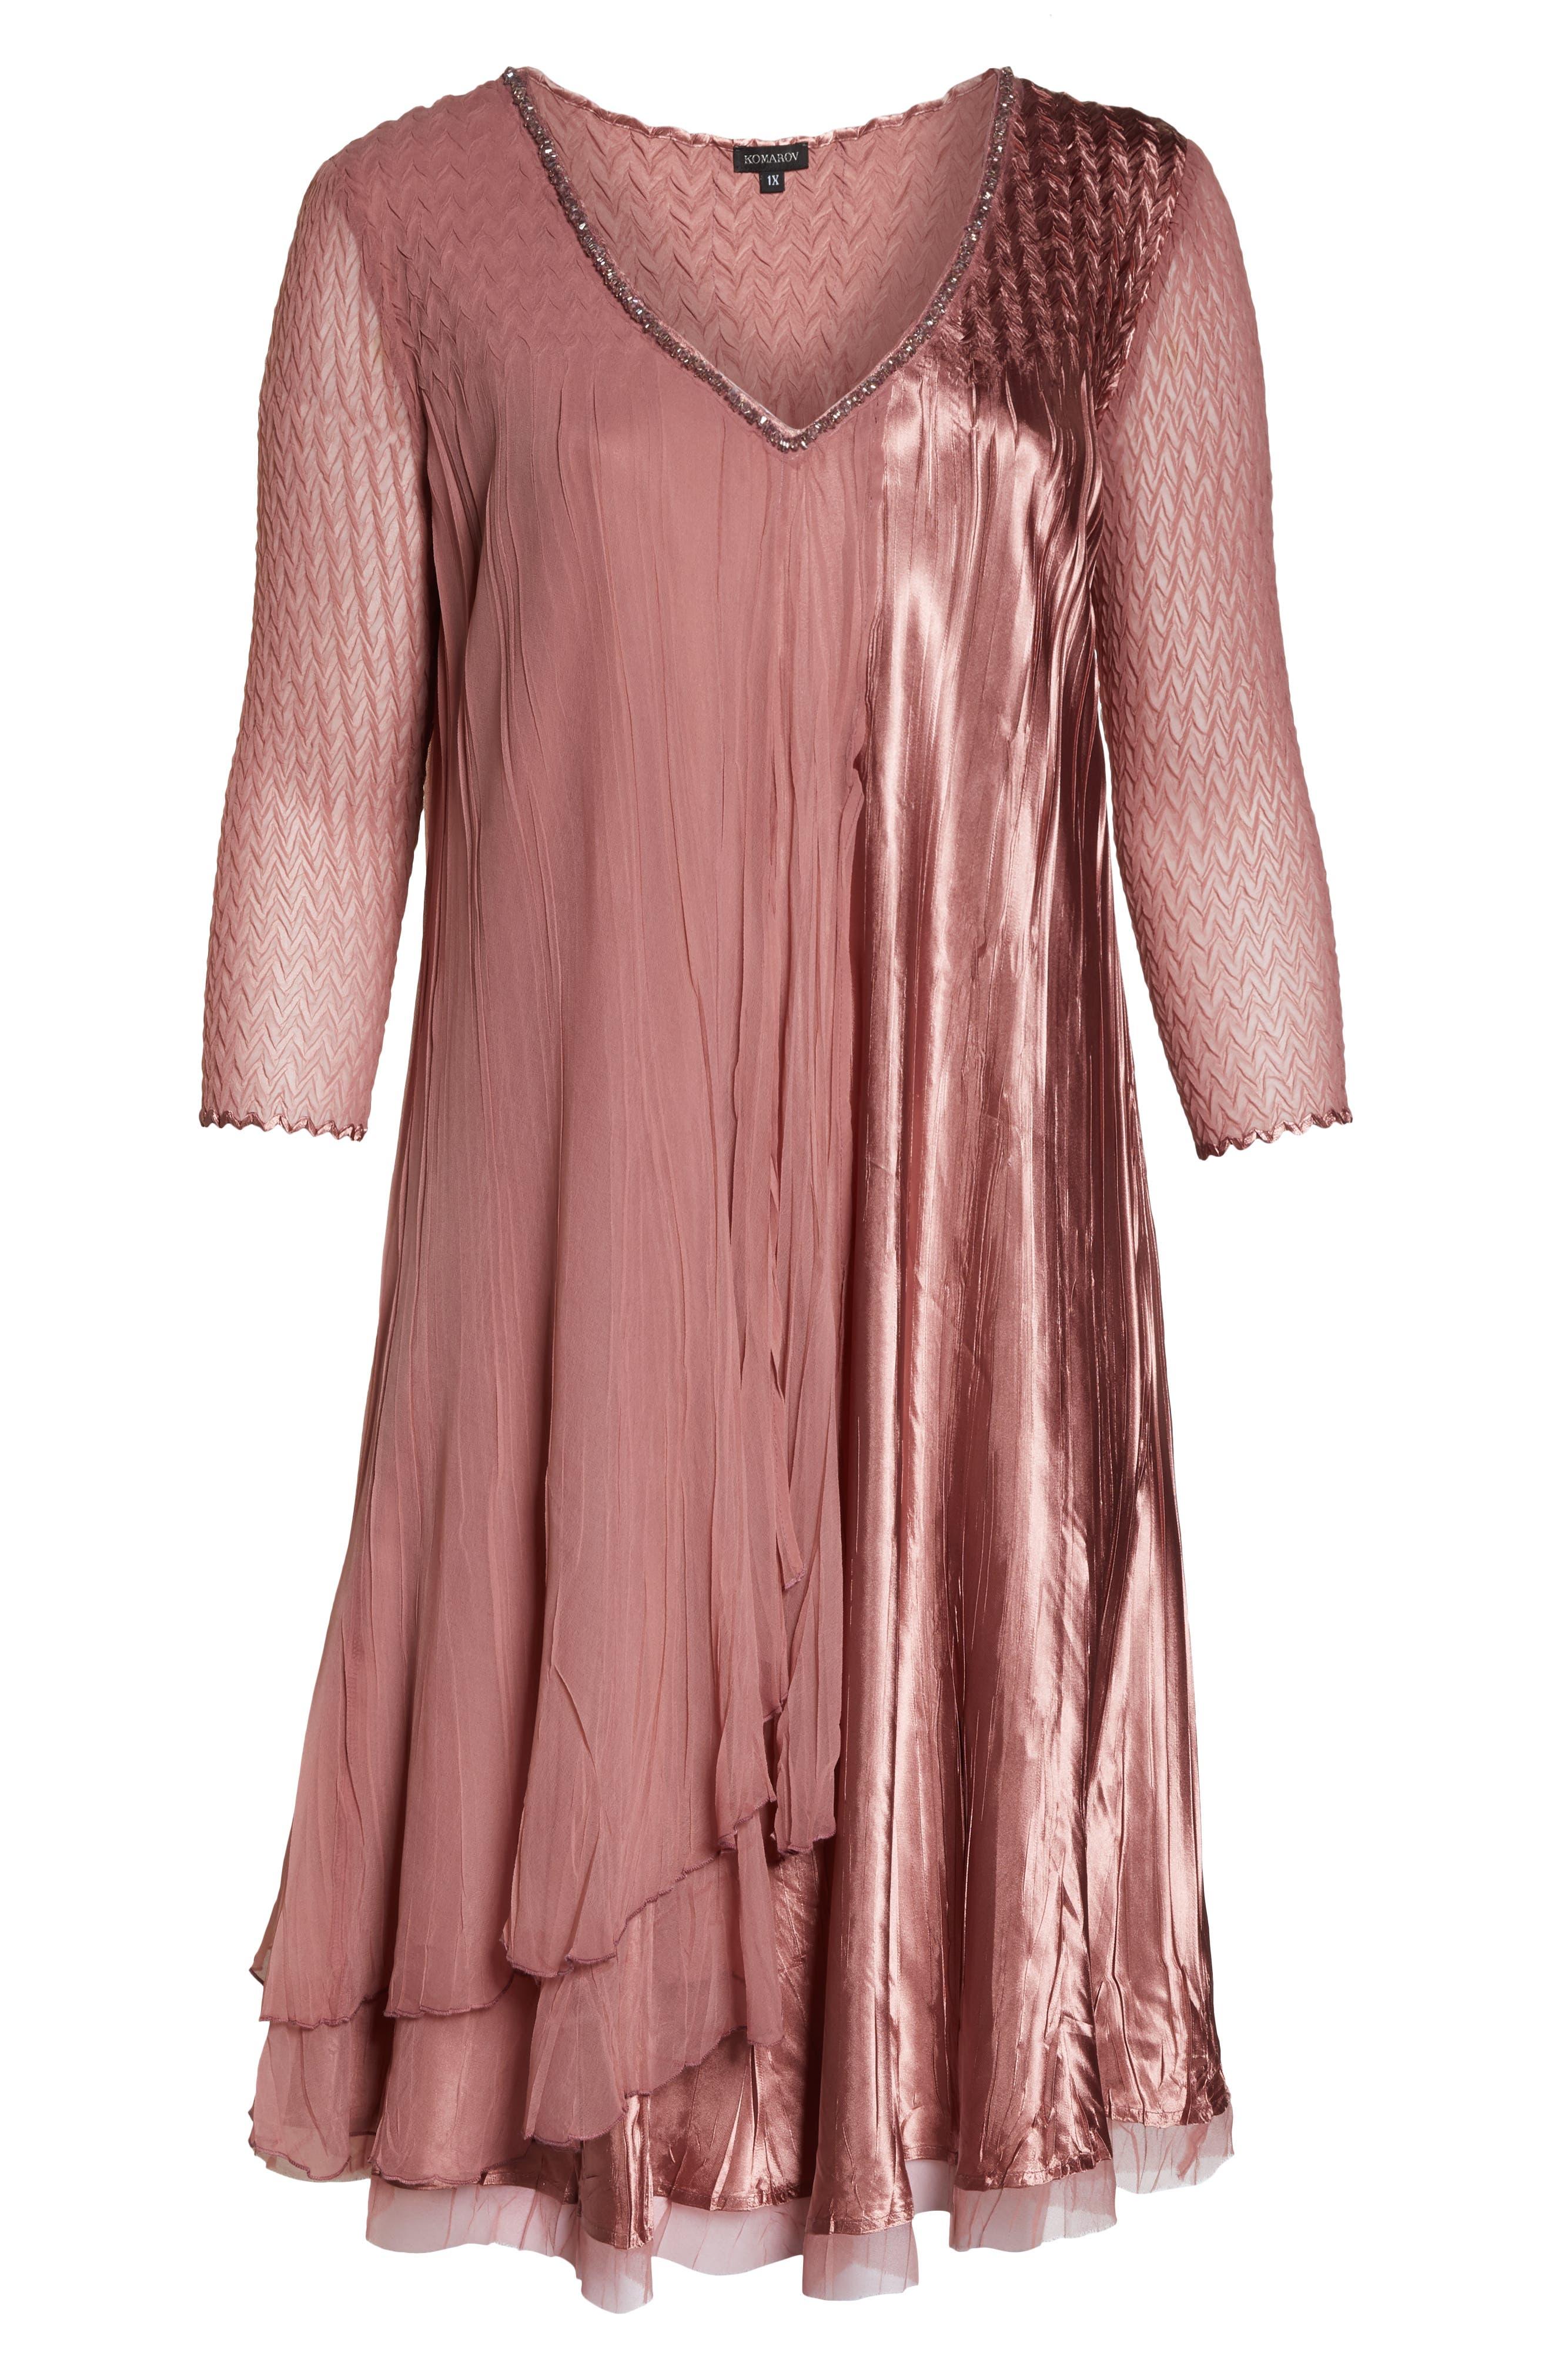 KOMAROV, Tiered A-Line Dress, Alternate thumbnail 7, color, 680